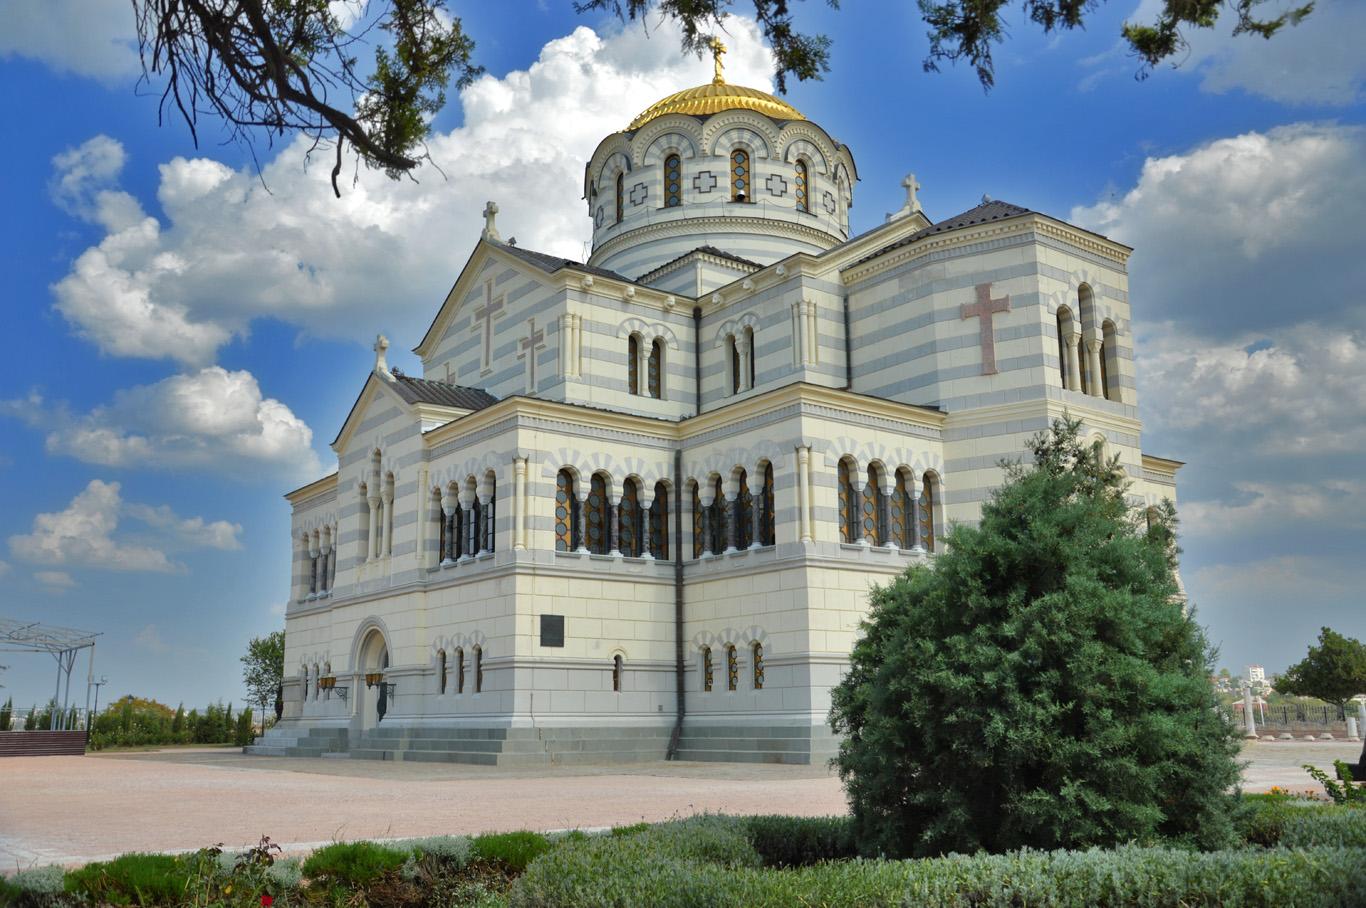 St. Vladimir Cathedral in Chersonesus